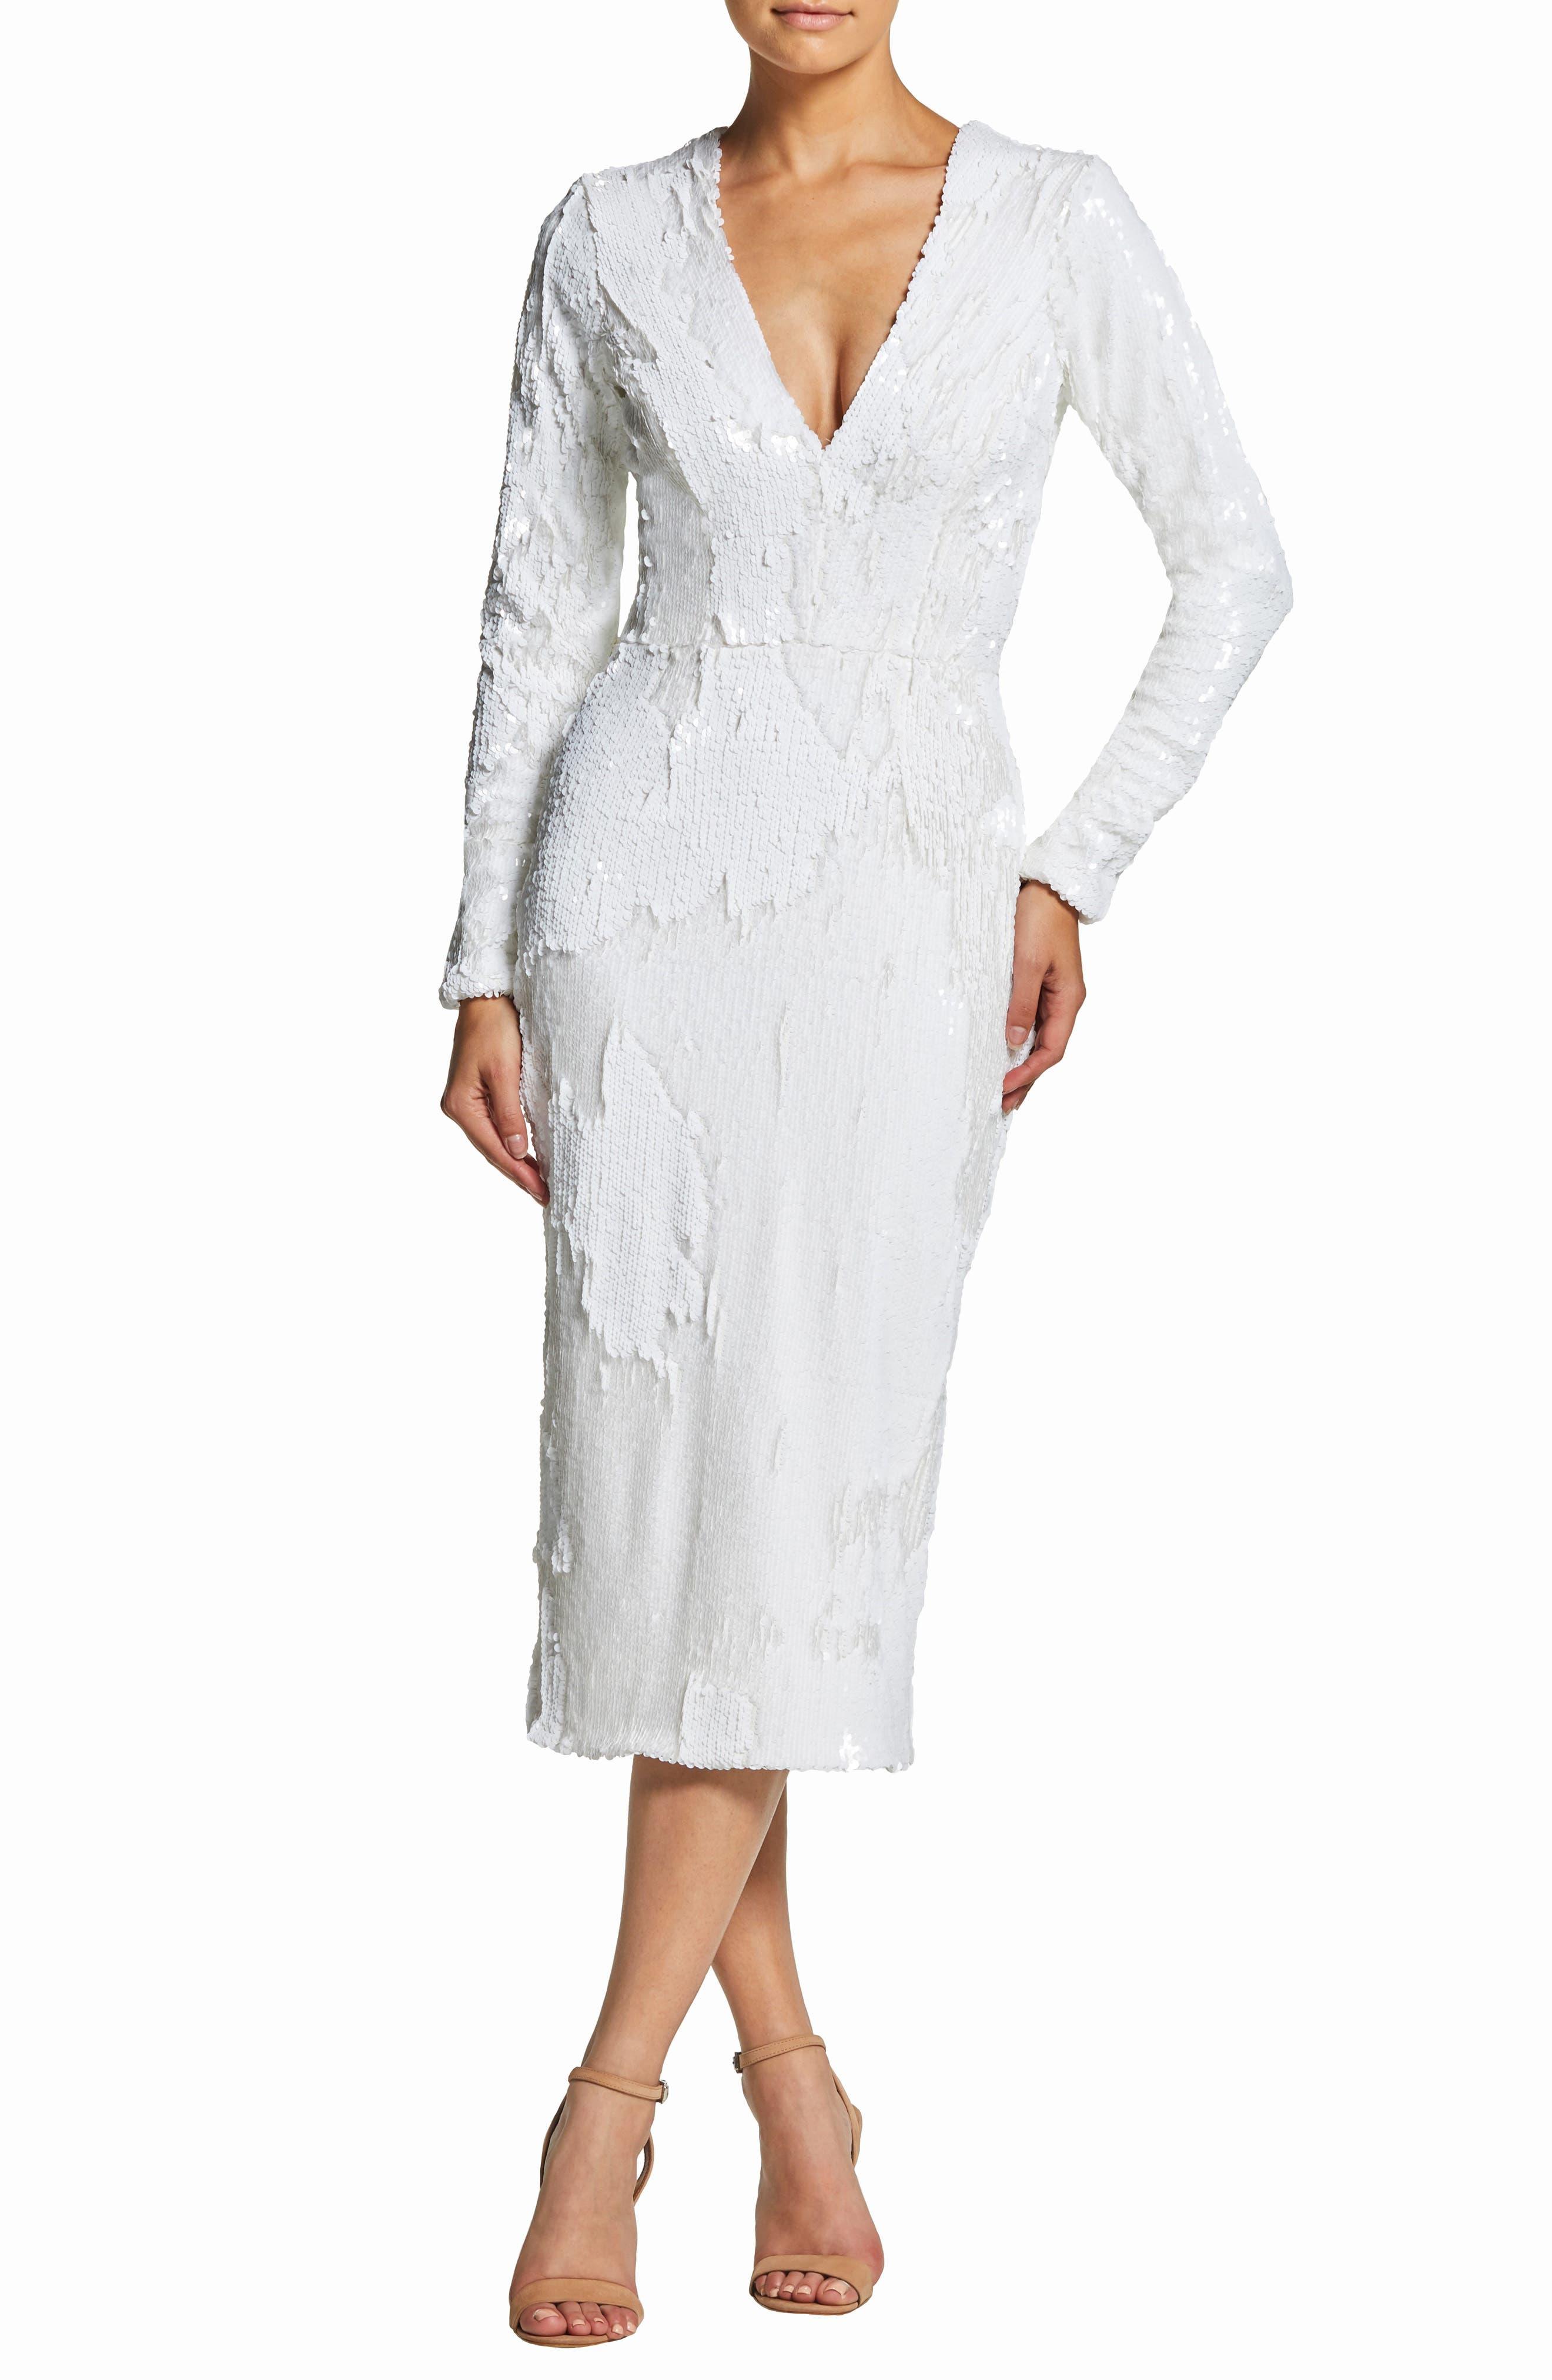 DRESS THE POPULATION, Elizabeth Plunge Midi Dress, Main thumbnail 1, color, LILY